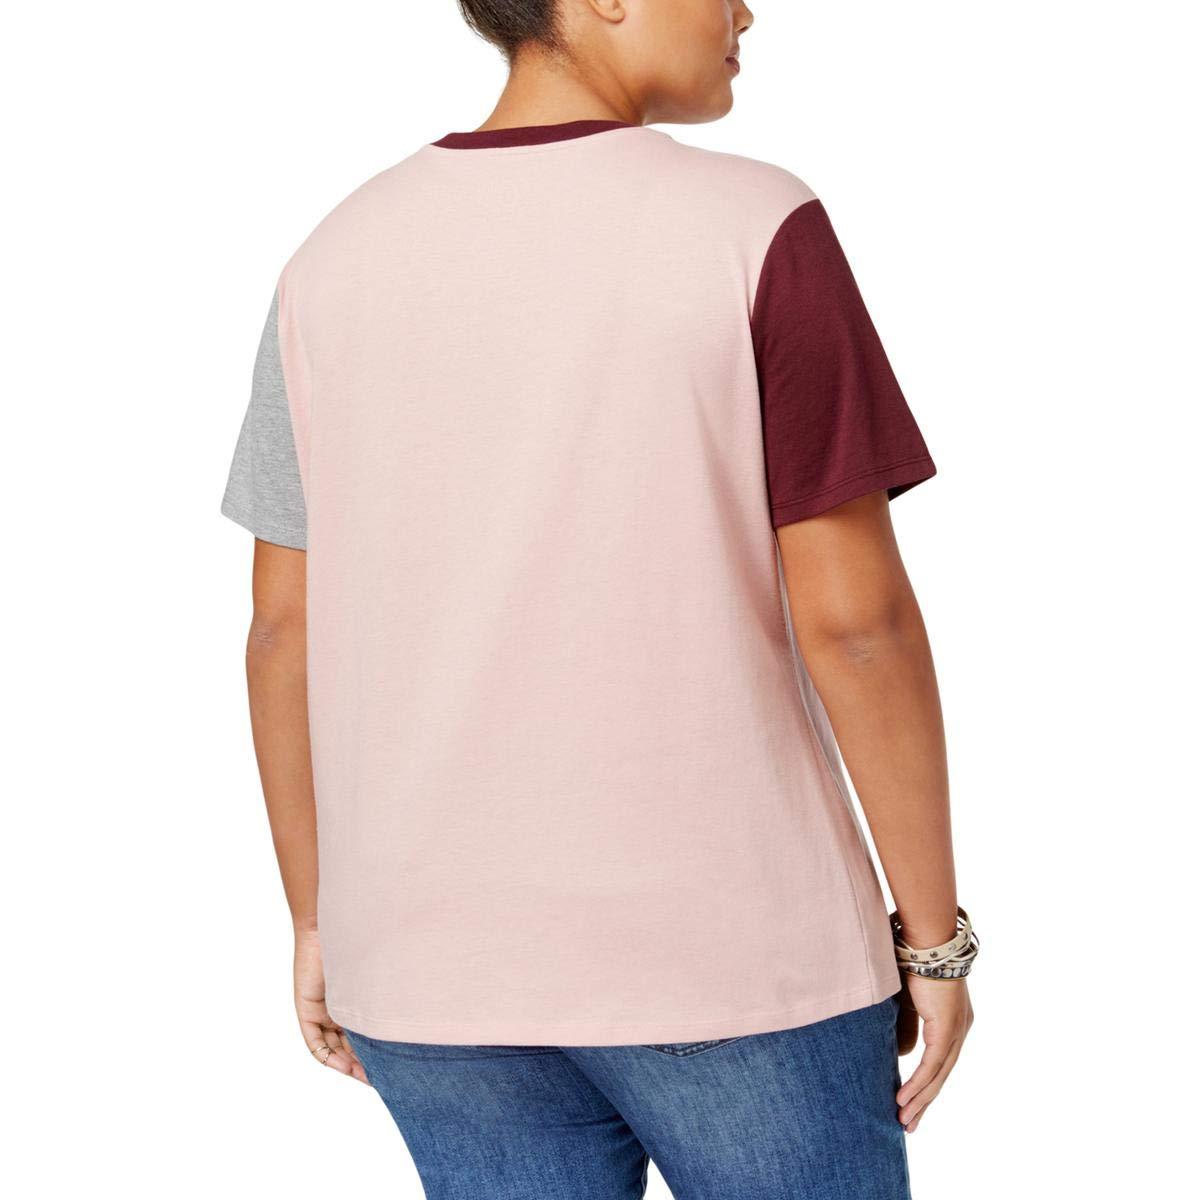 Hybrid Trendy Plus Size Colorblocked Graphic T-Shirt